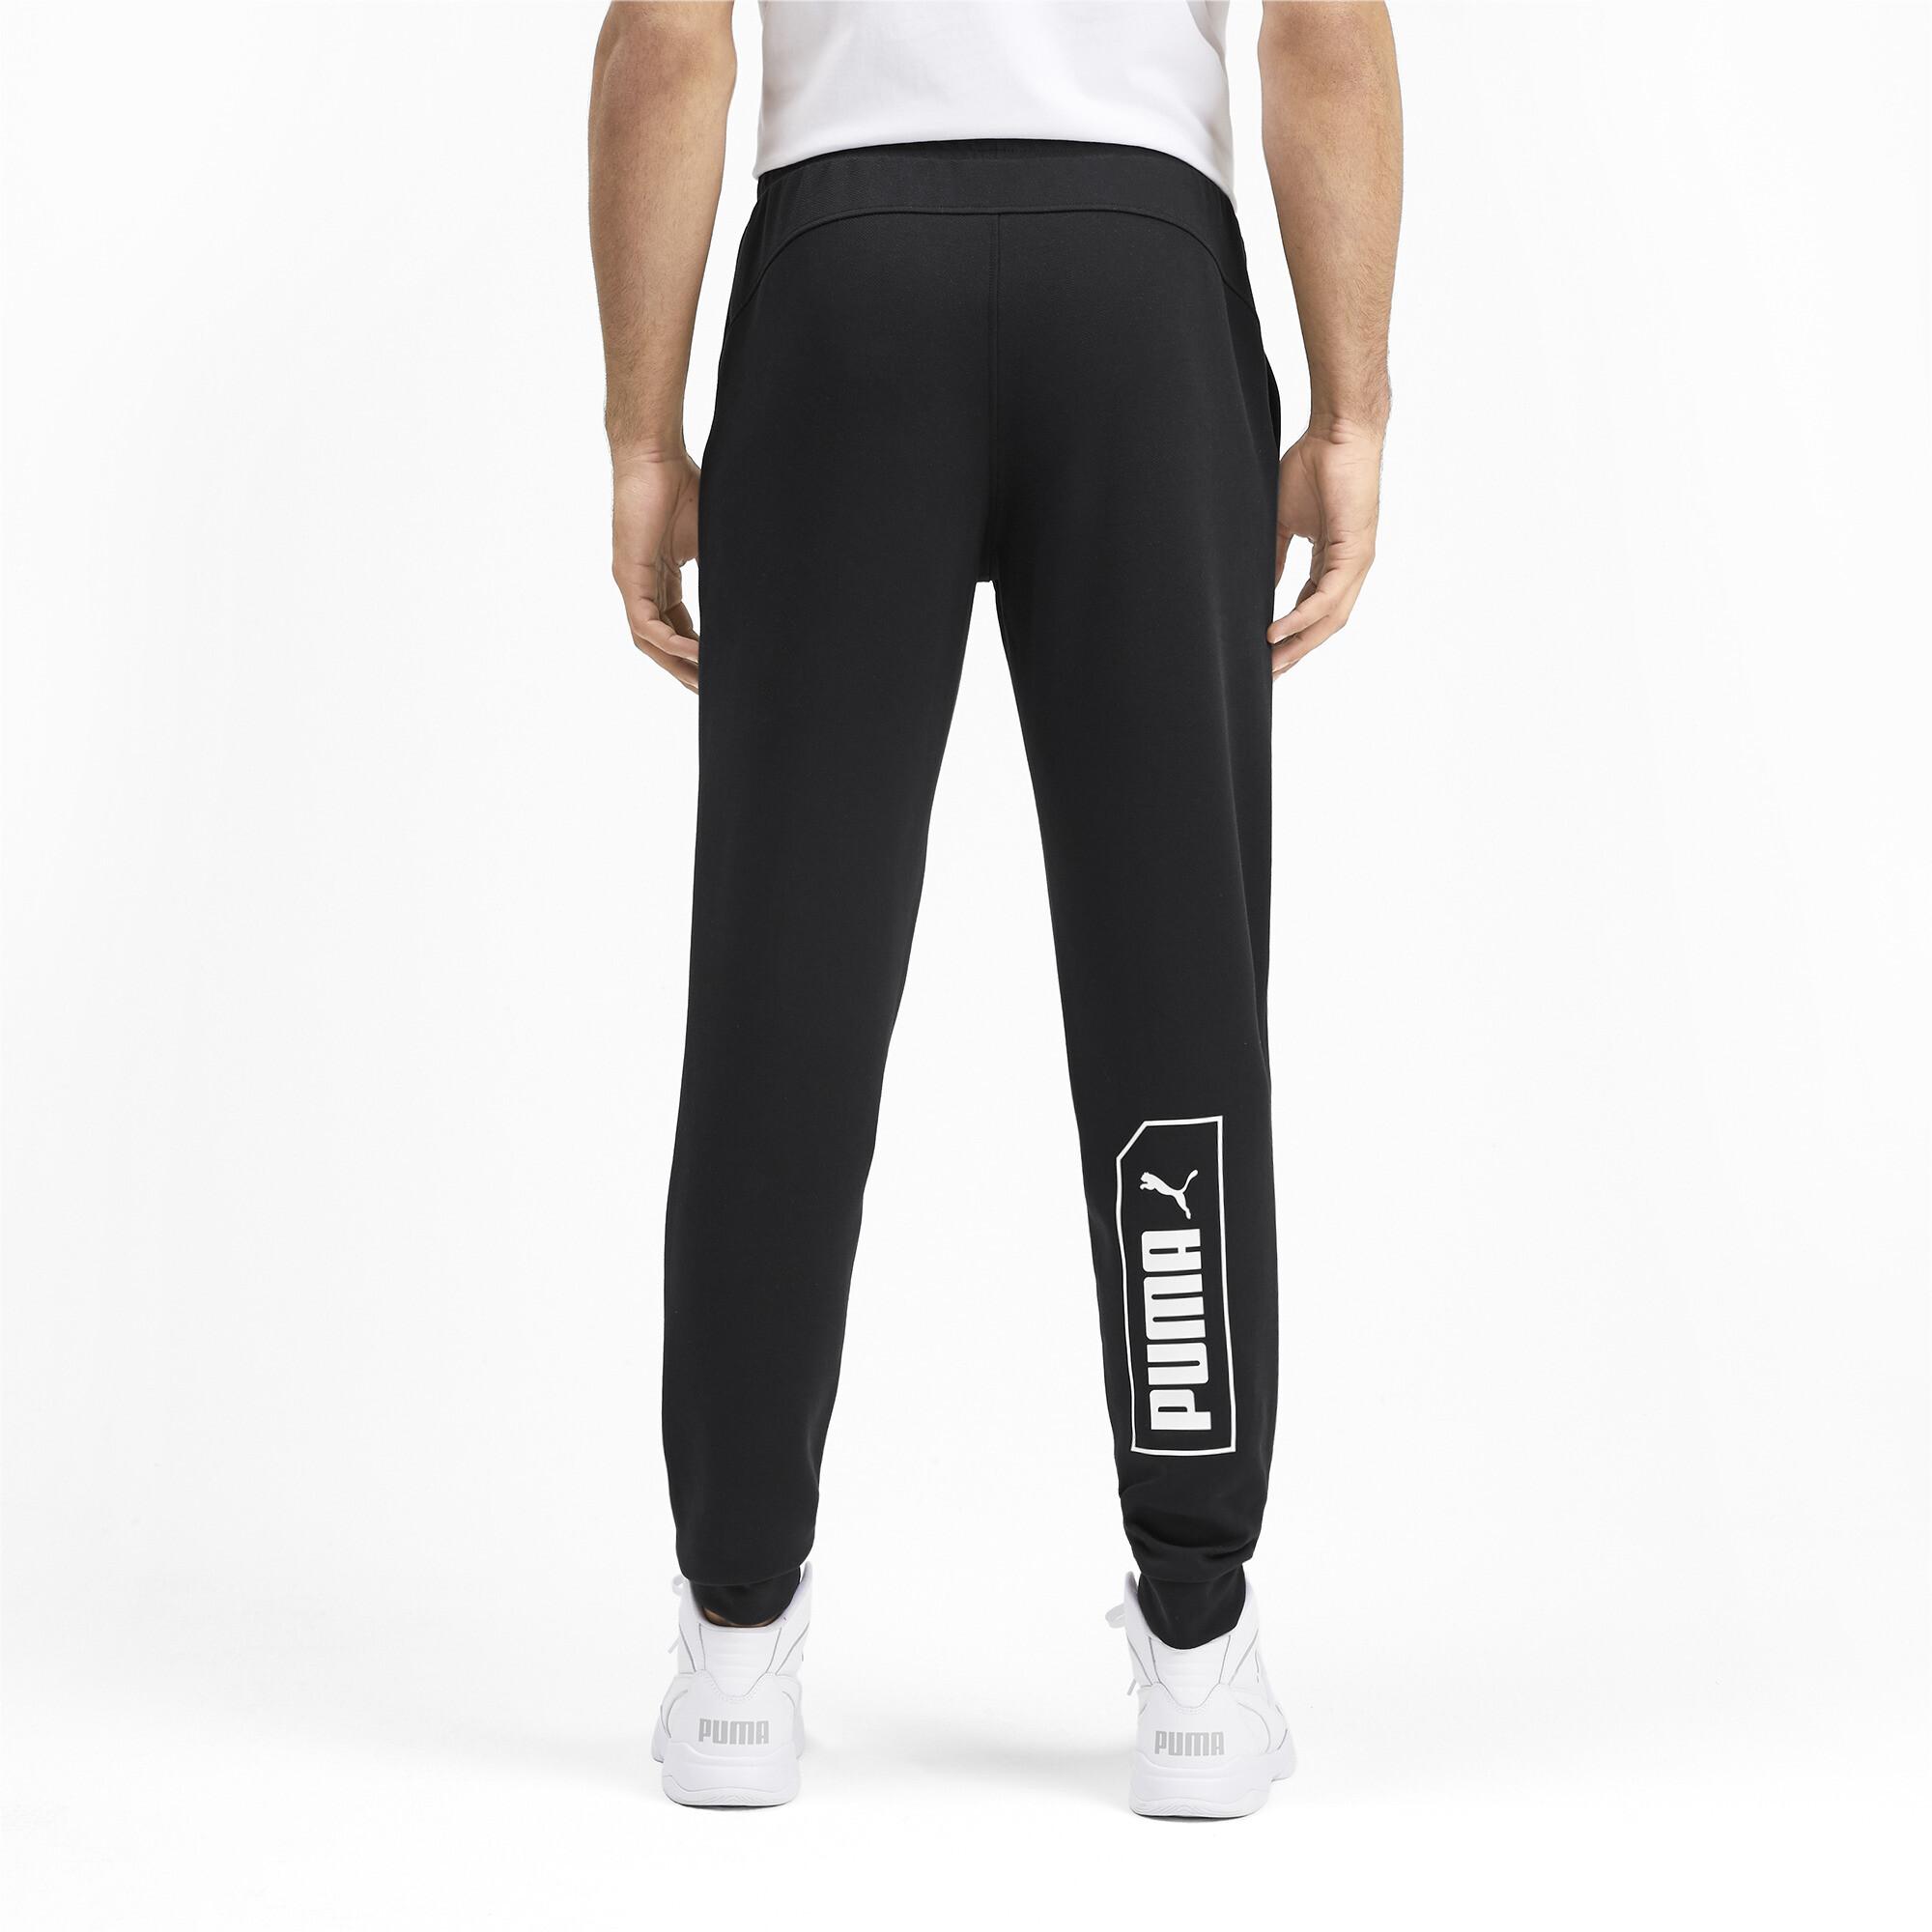 PUMA-NU-TILITY-Men-039-s-Sweatpants-Men-Knitted-Pants-Basics thumbnail 20